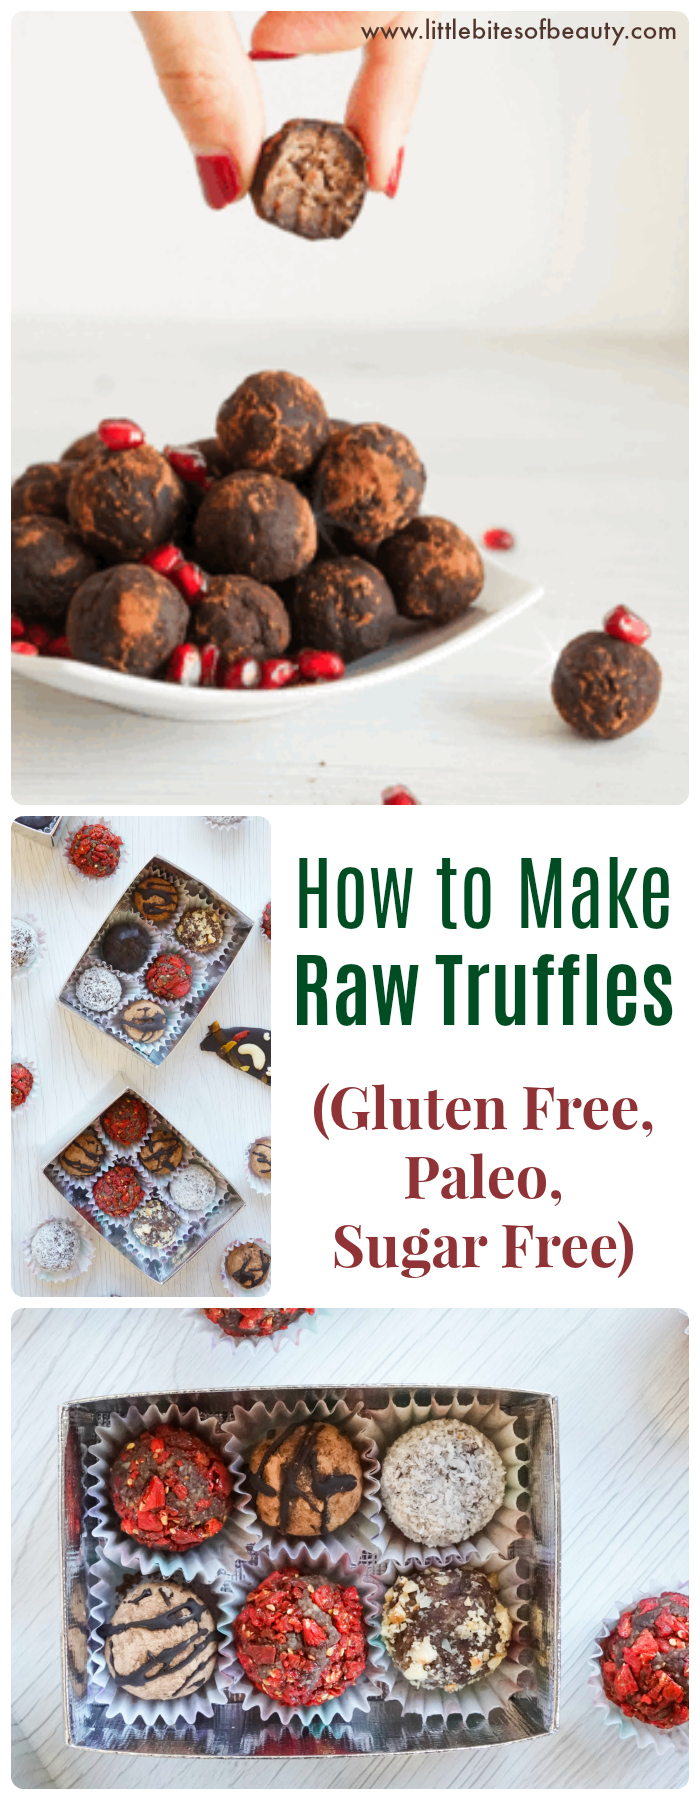 How to Make Raw Truffles (Gluten Free, Paleo, Sugar Free)